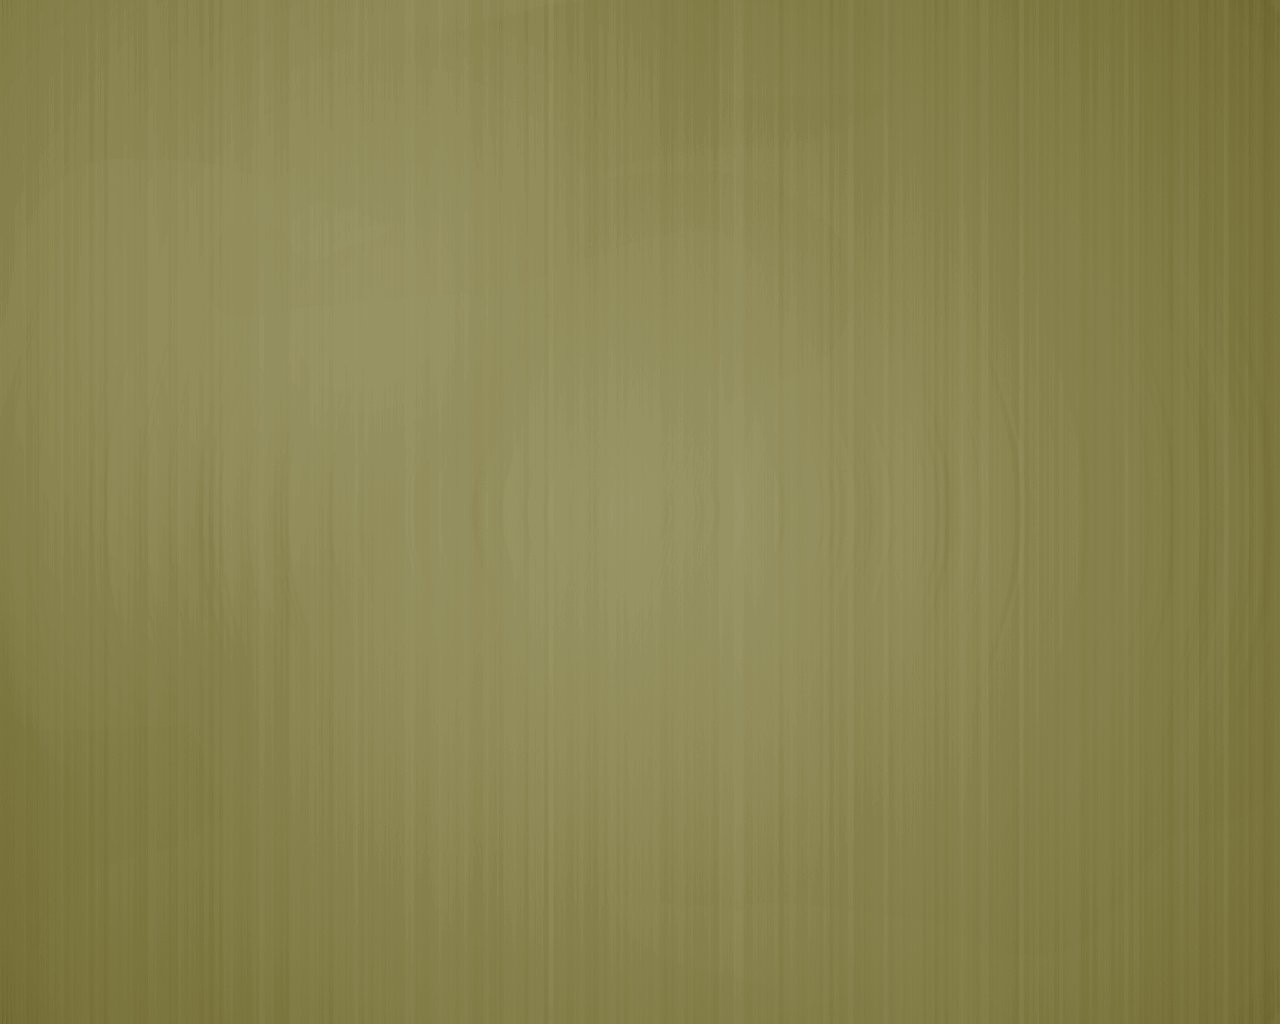 wallpaper stripes green5 by 10r